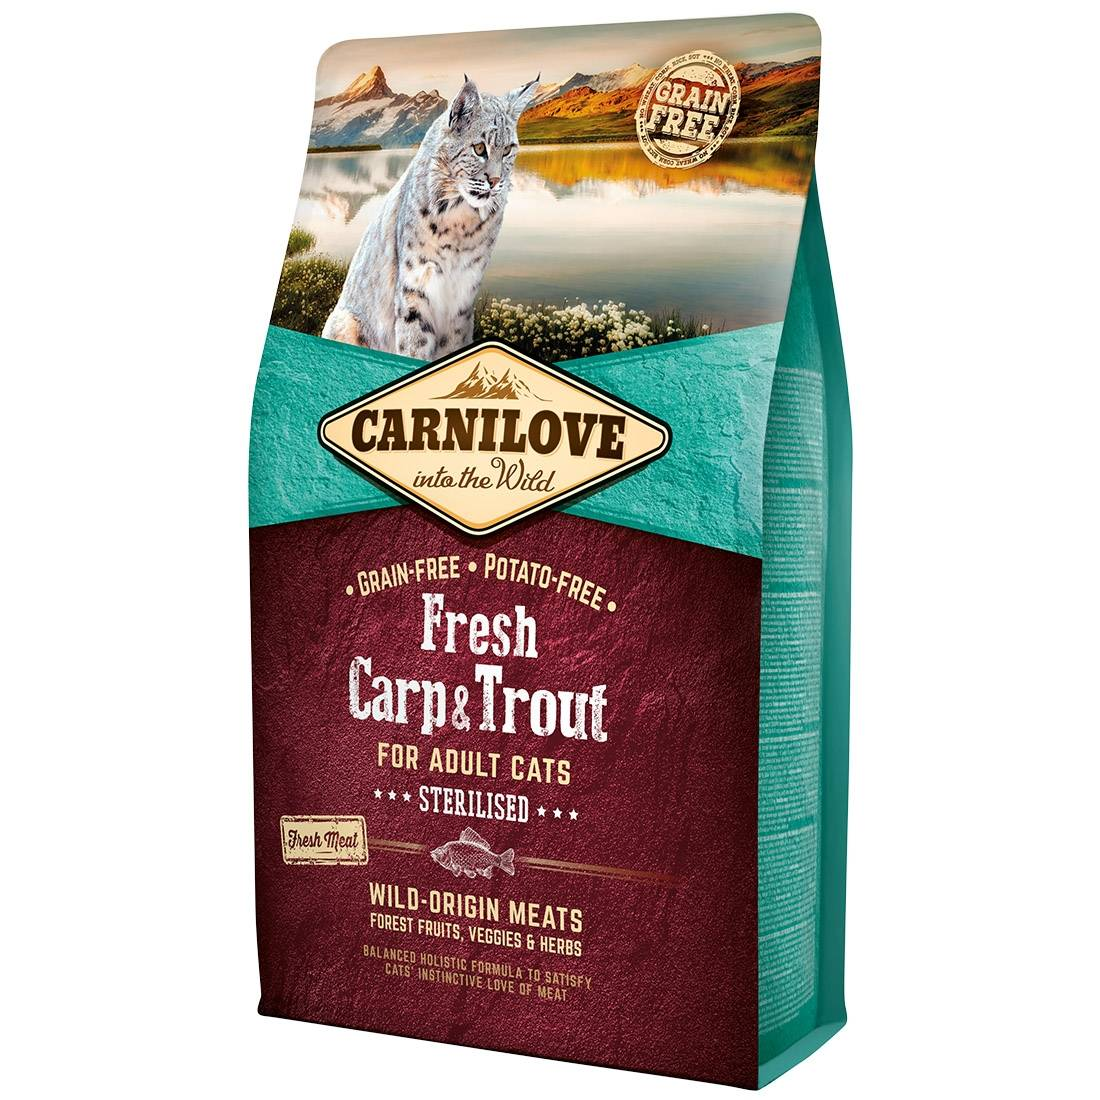 Carnilove Croquettes chat CARNILOVE Adult Sterilised Fresh Carp & Trout Contenance : 400 g